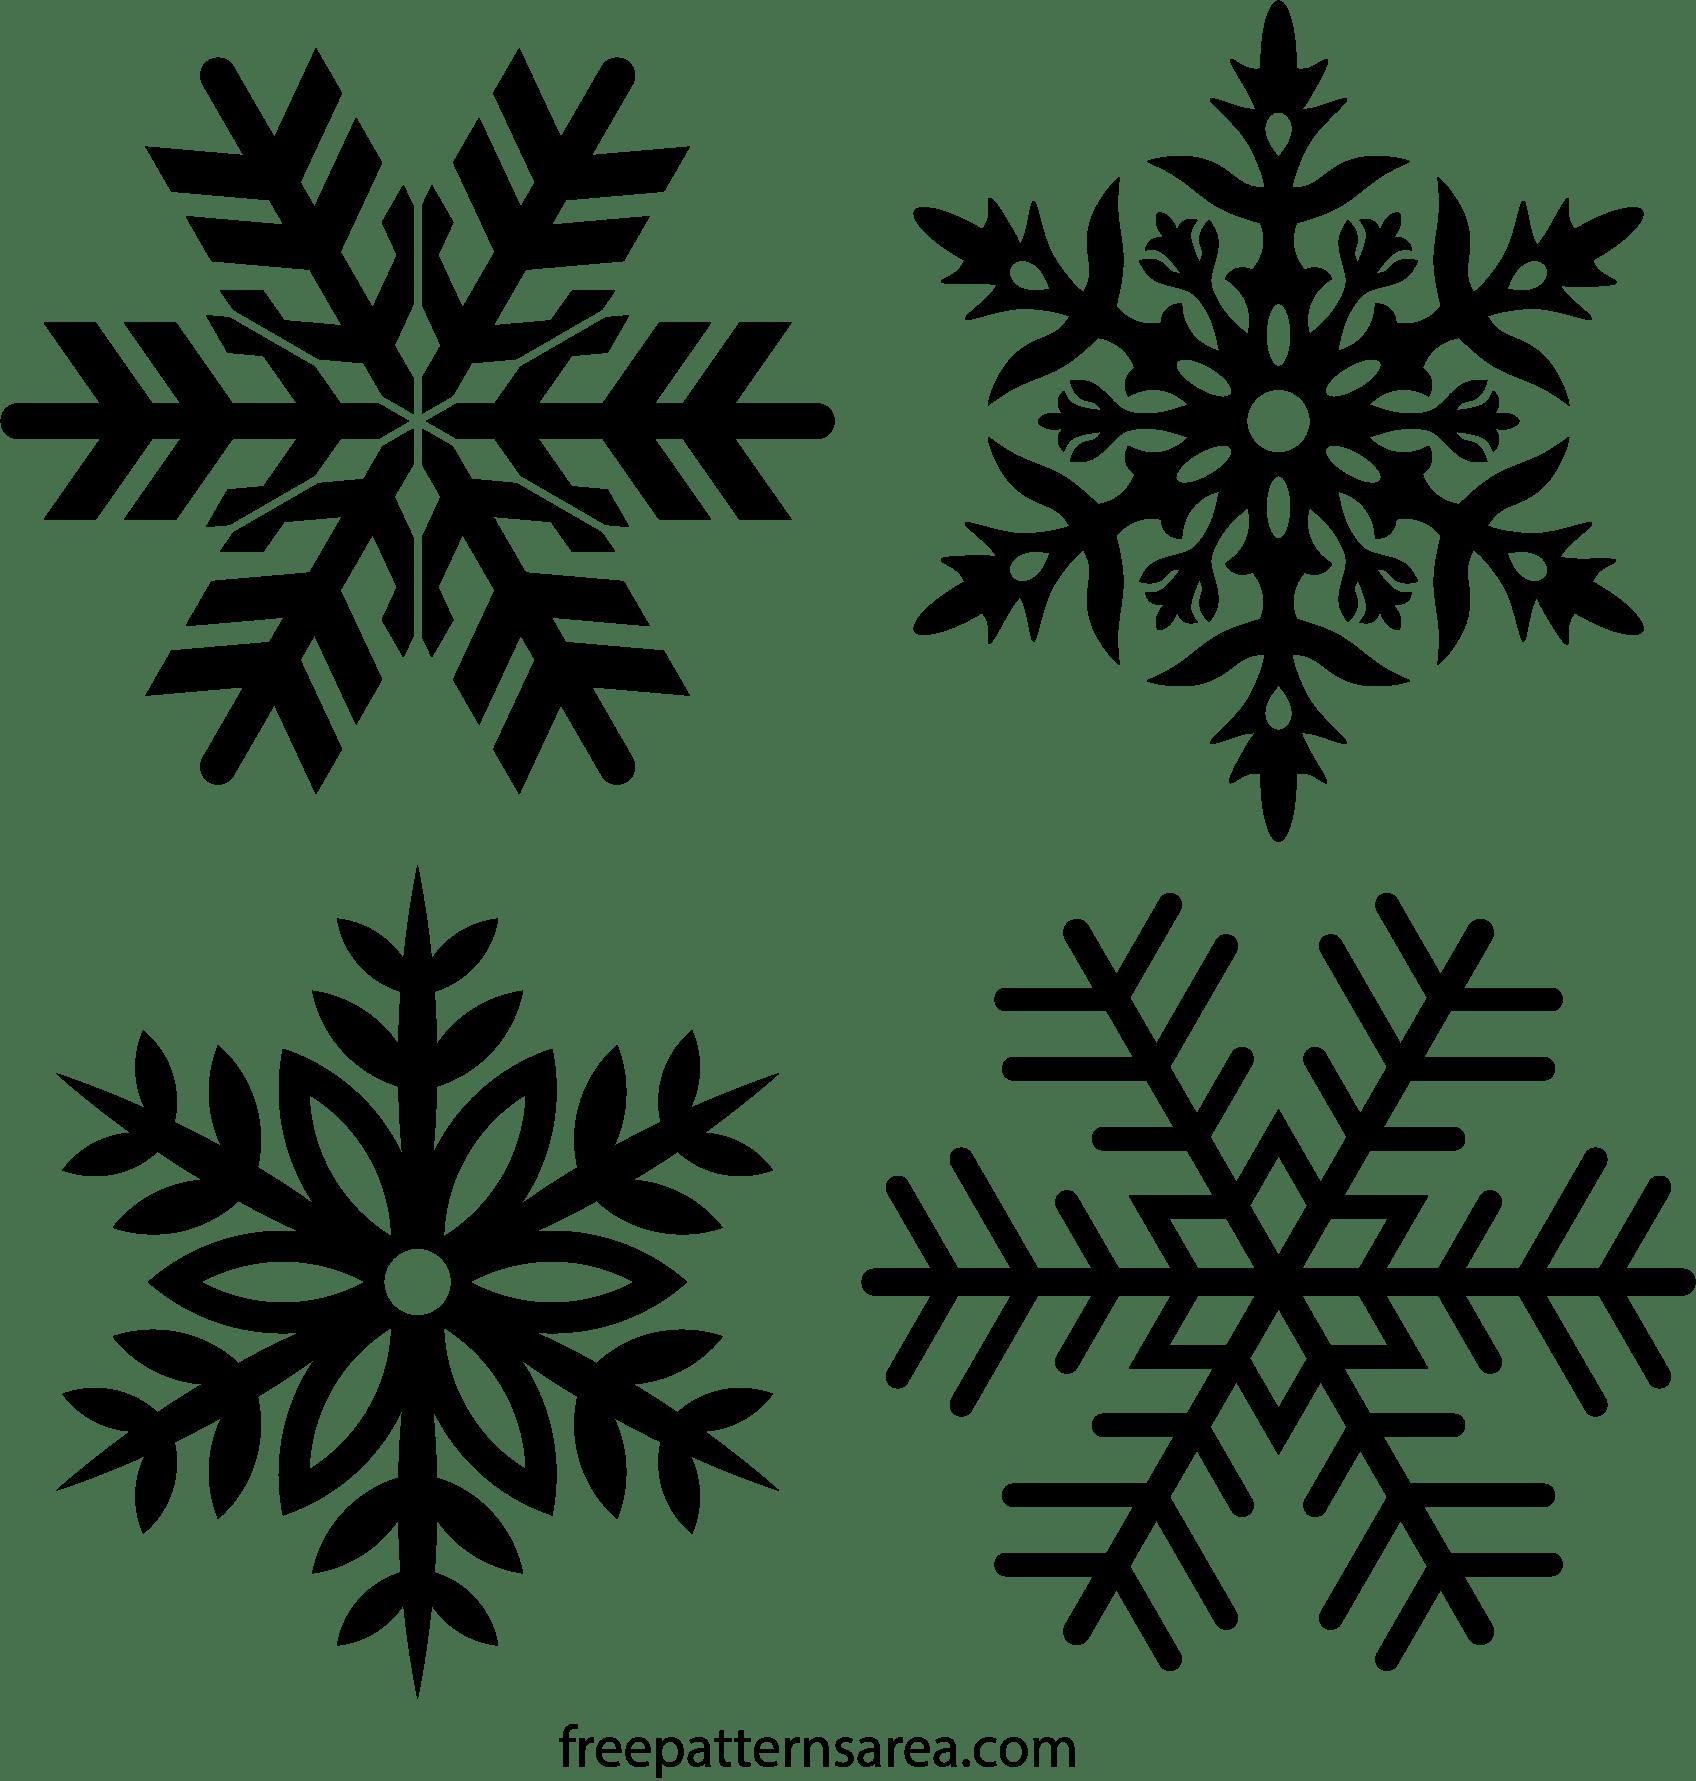 Free Snowflake Stencil Vector